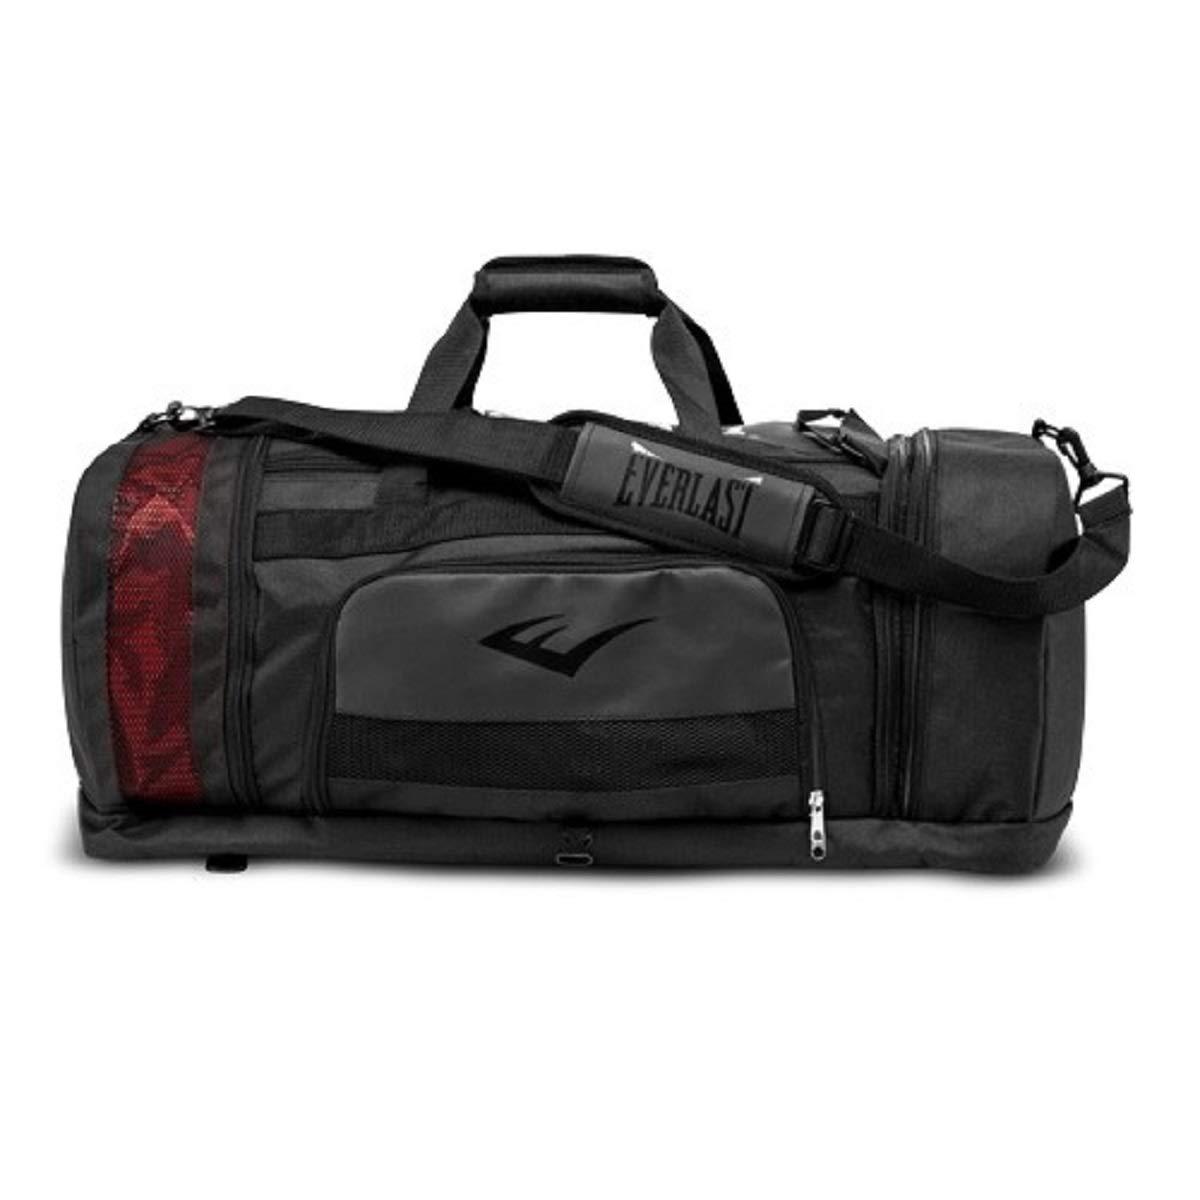 Tenzing TZ 1250 Lumbar Backpack Polyester